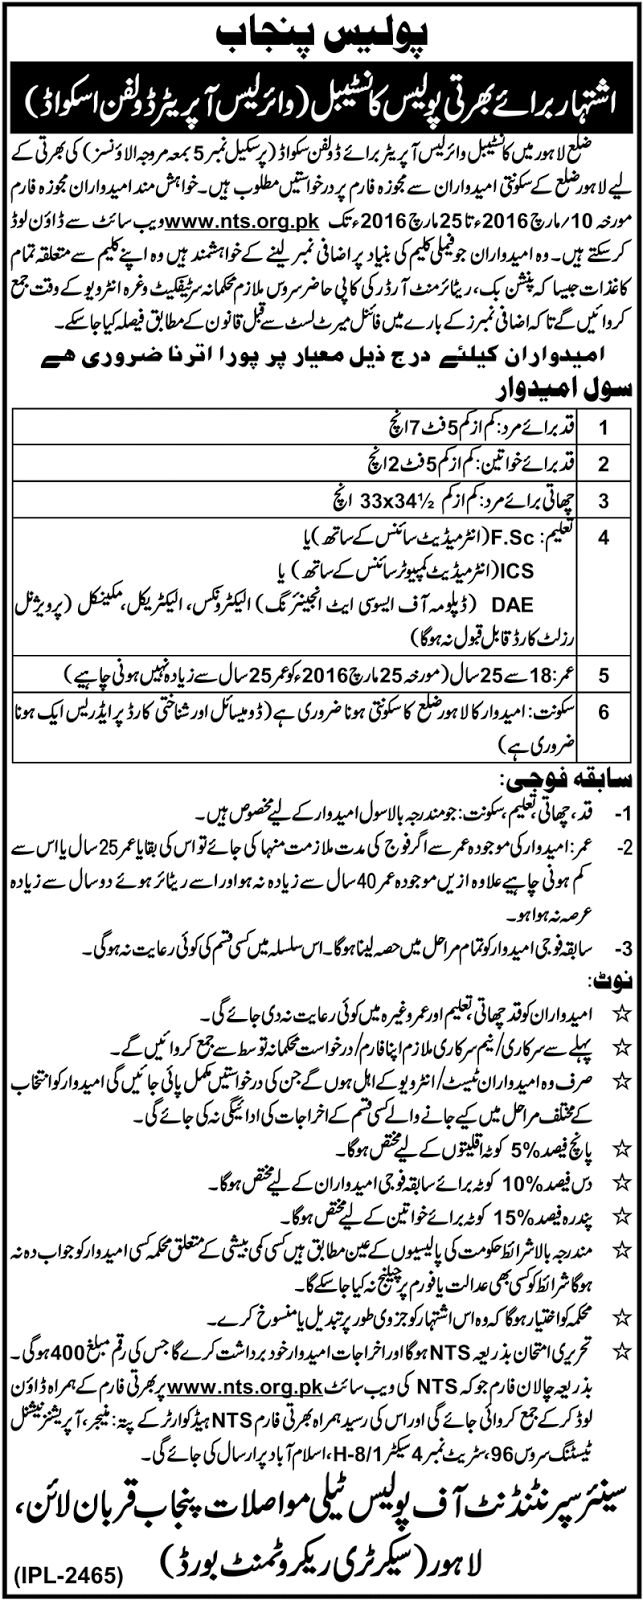 JobEye : Punjab Police Department jobs Lahore  latest 2016 ...